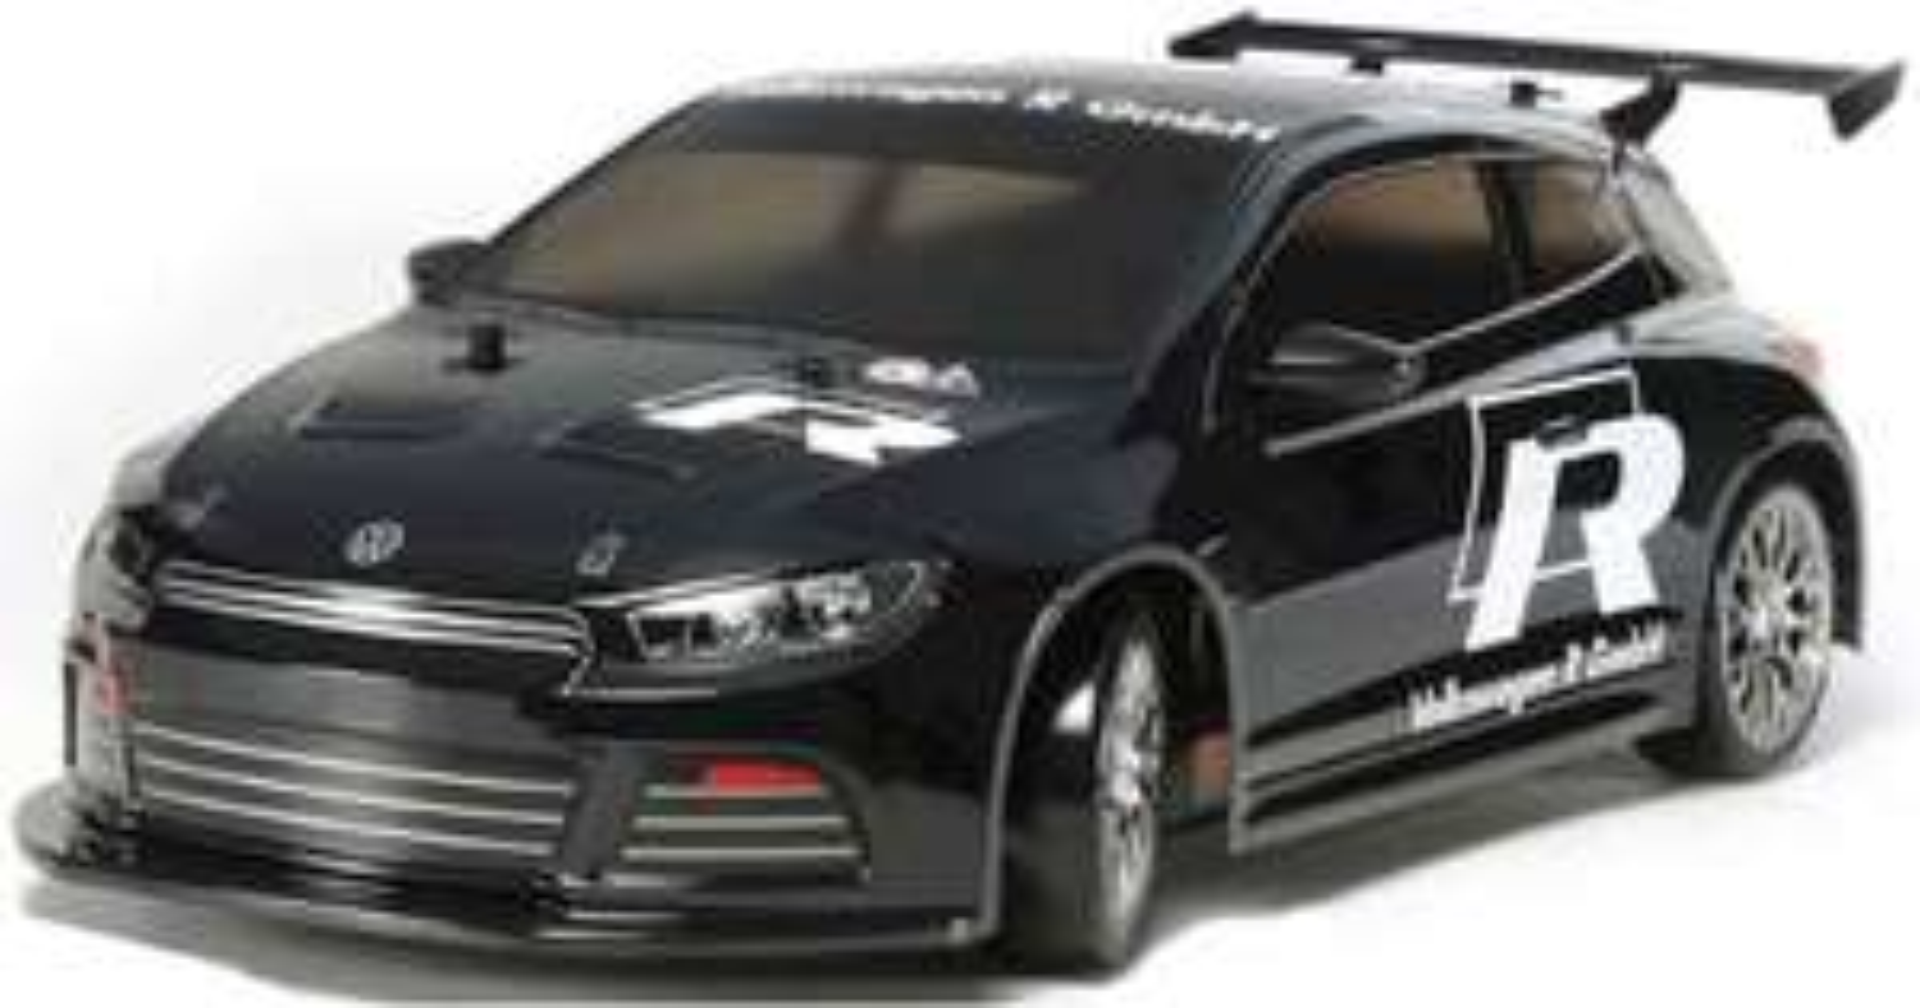 Sélection de voitures radiocommandés en promotion - Ex: Voiture Radiocommandée Tamiya VW Scirocco GT24 R-Line - 1/10 EP (lindinger.at)